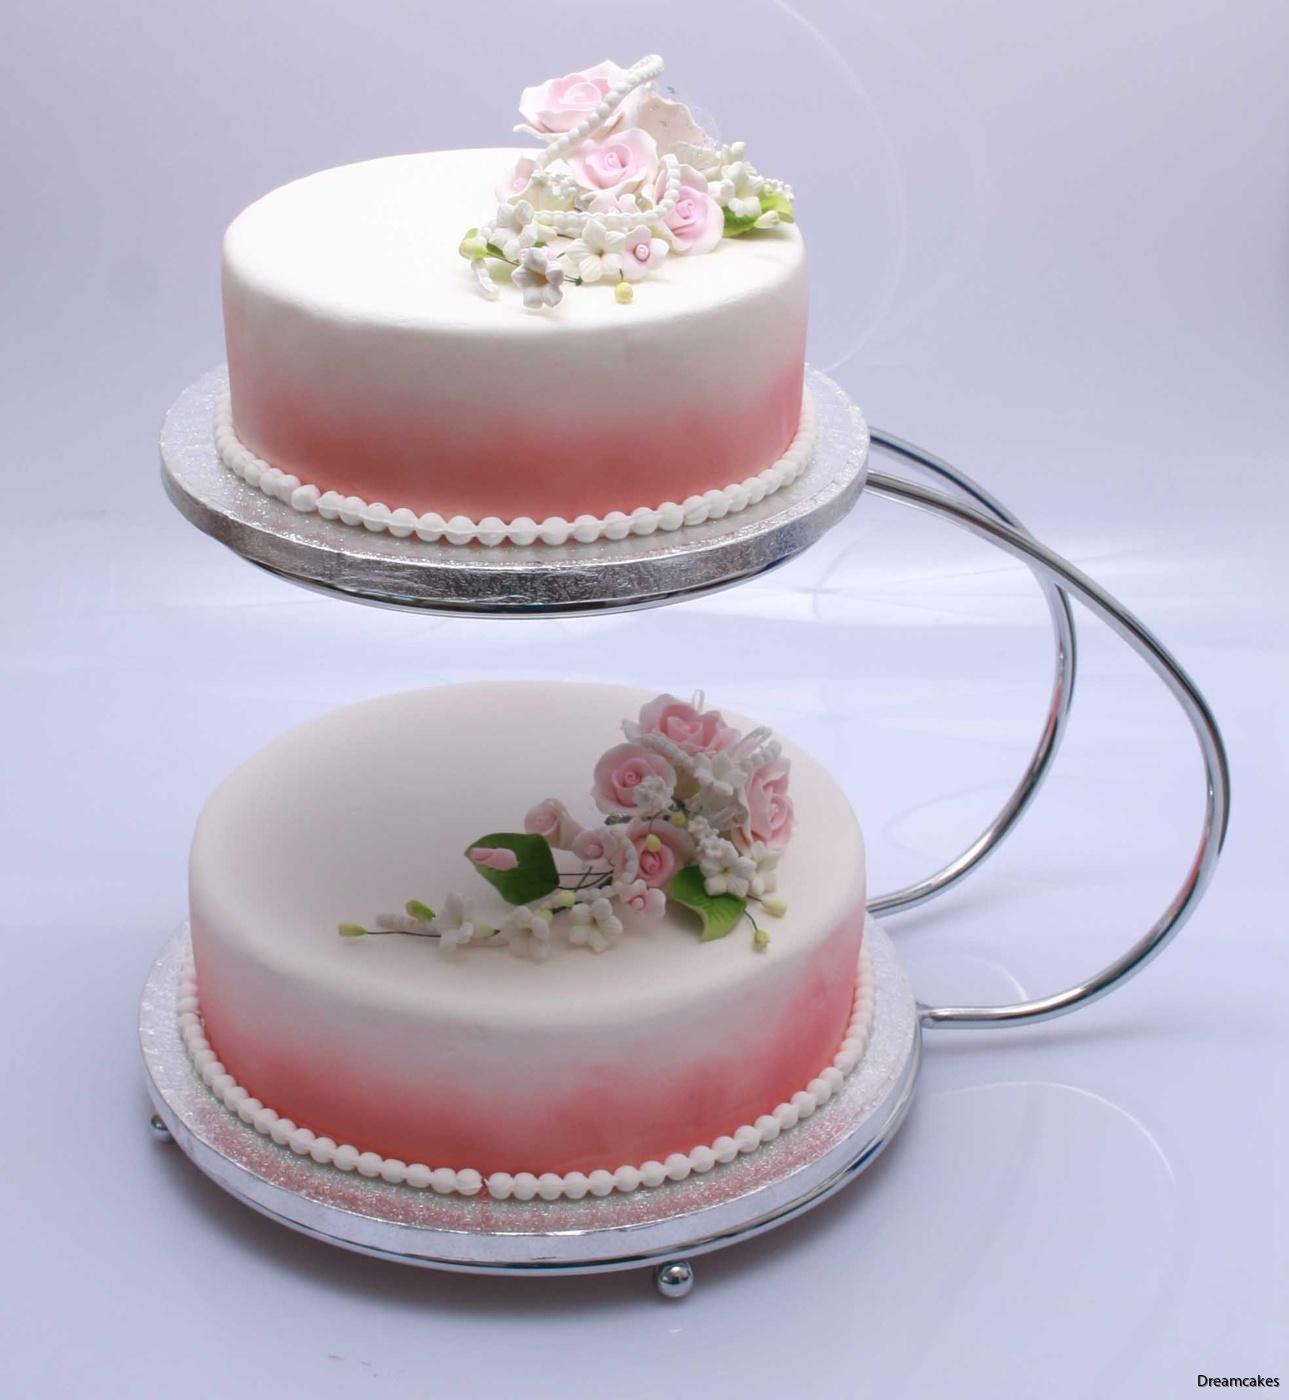 pärlbård, pärlbandsverktyg, pärlor på tårta, pärlband i socker, tårtdekorationer, tårtverktyg